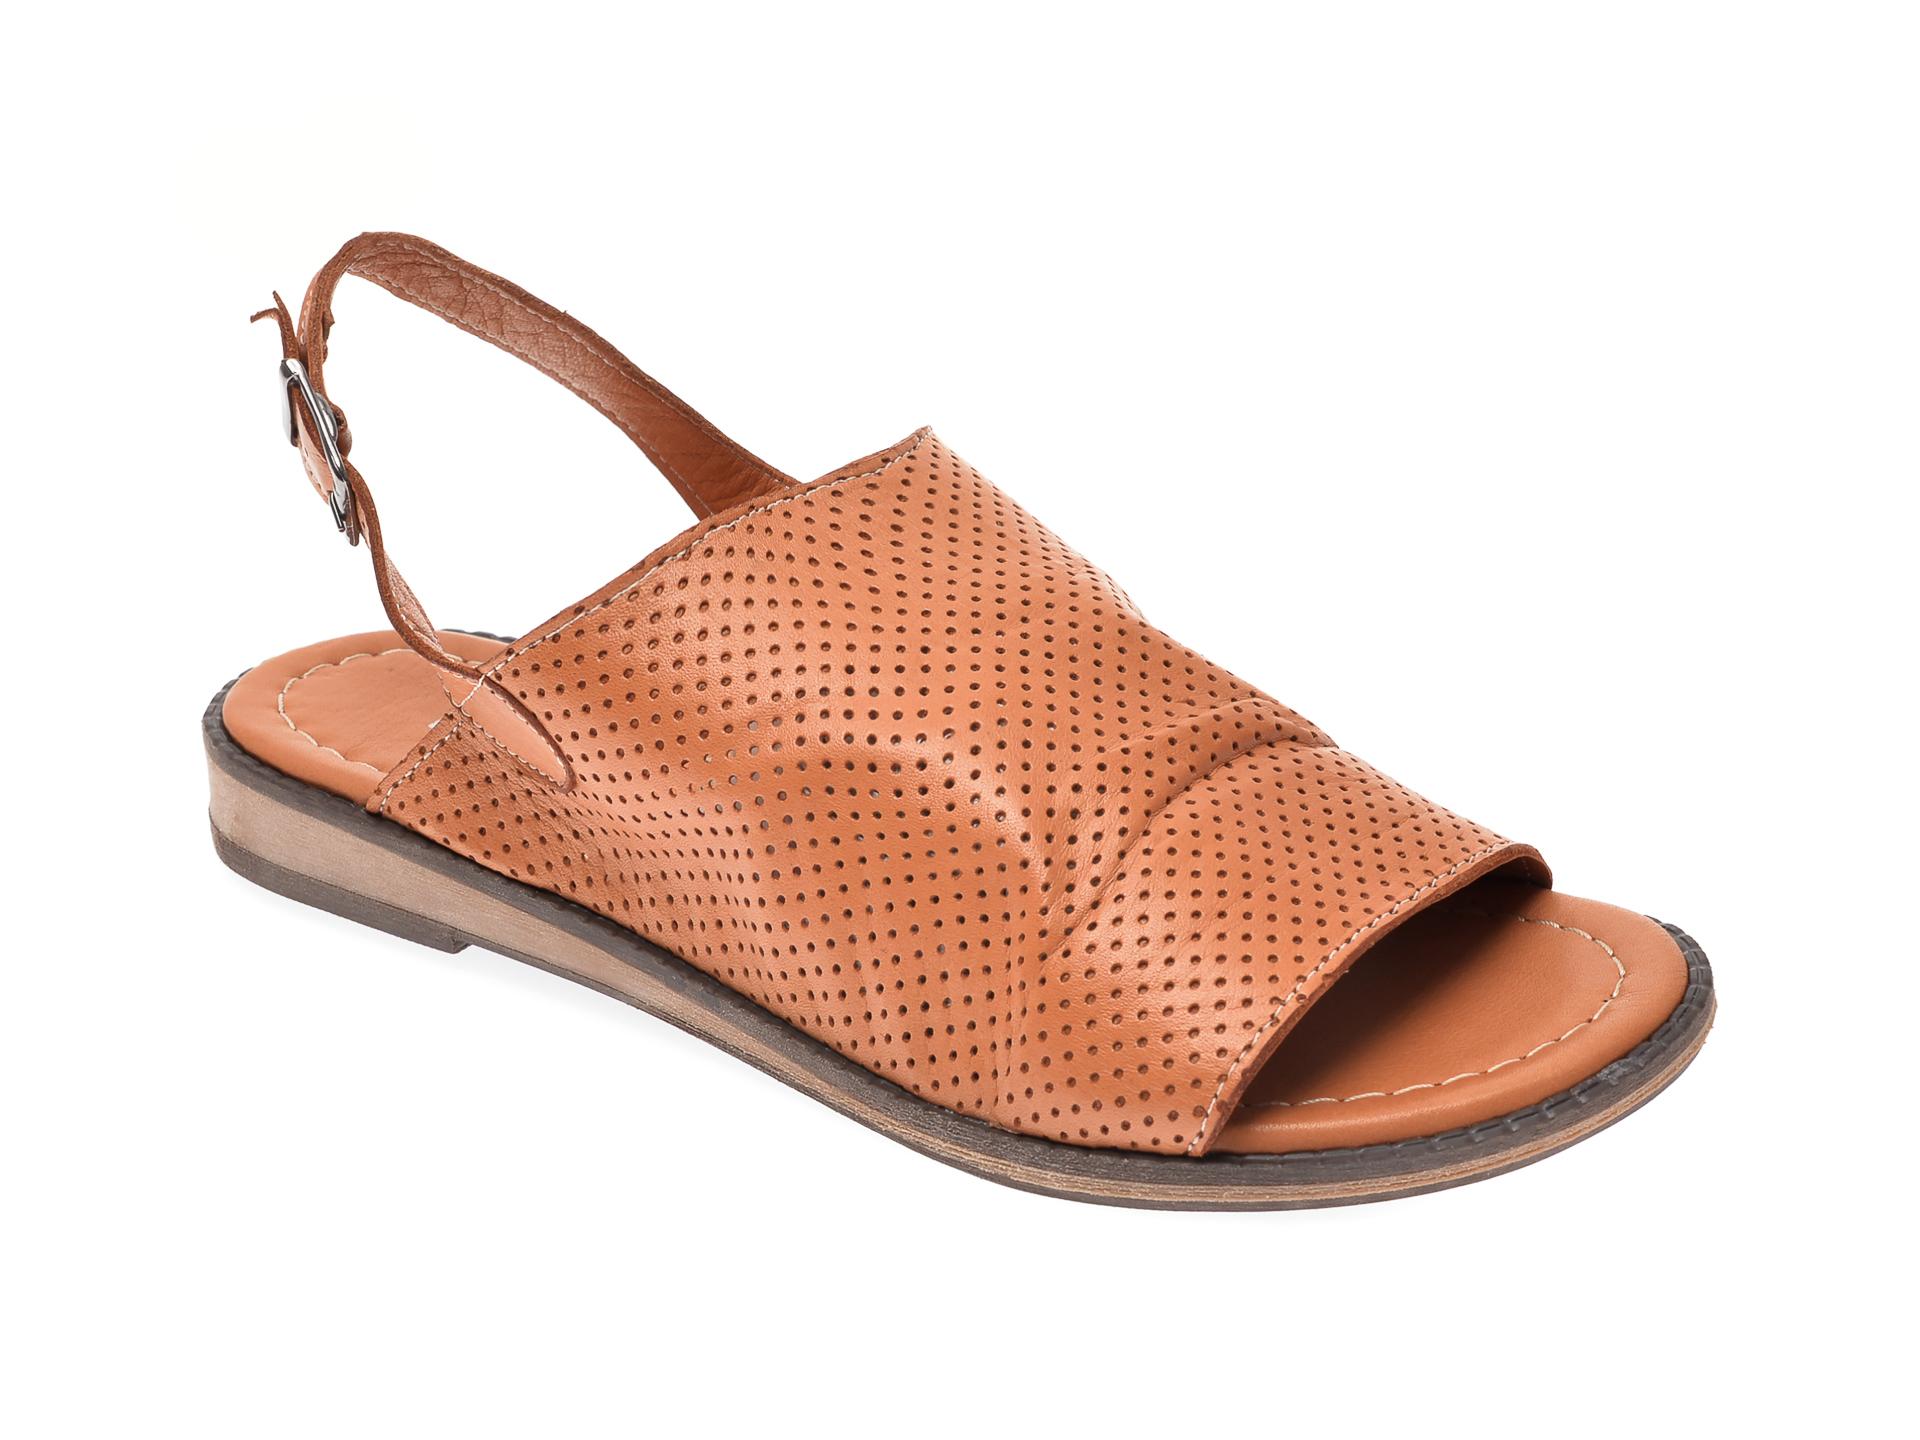 Sandale IMAGE maro, 201, din piele naturala